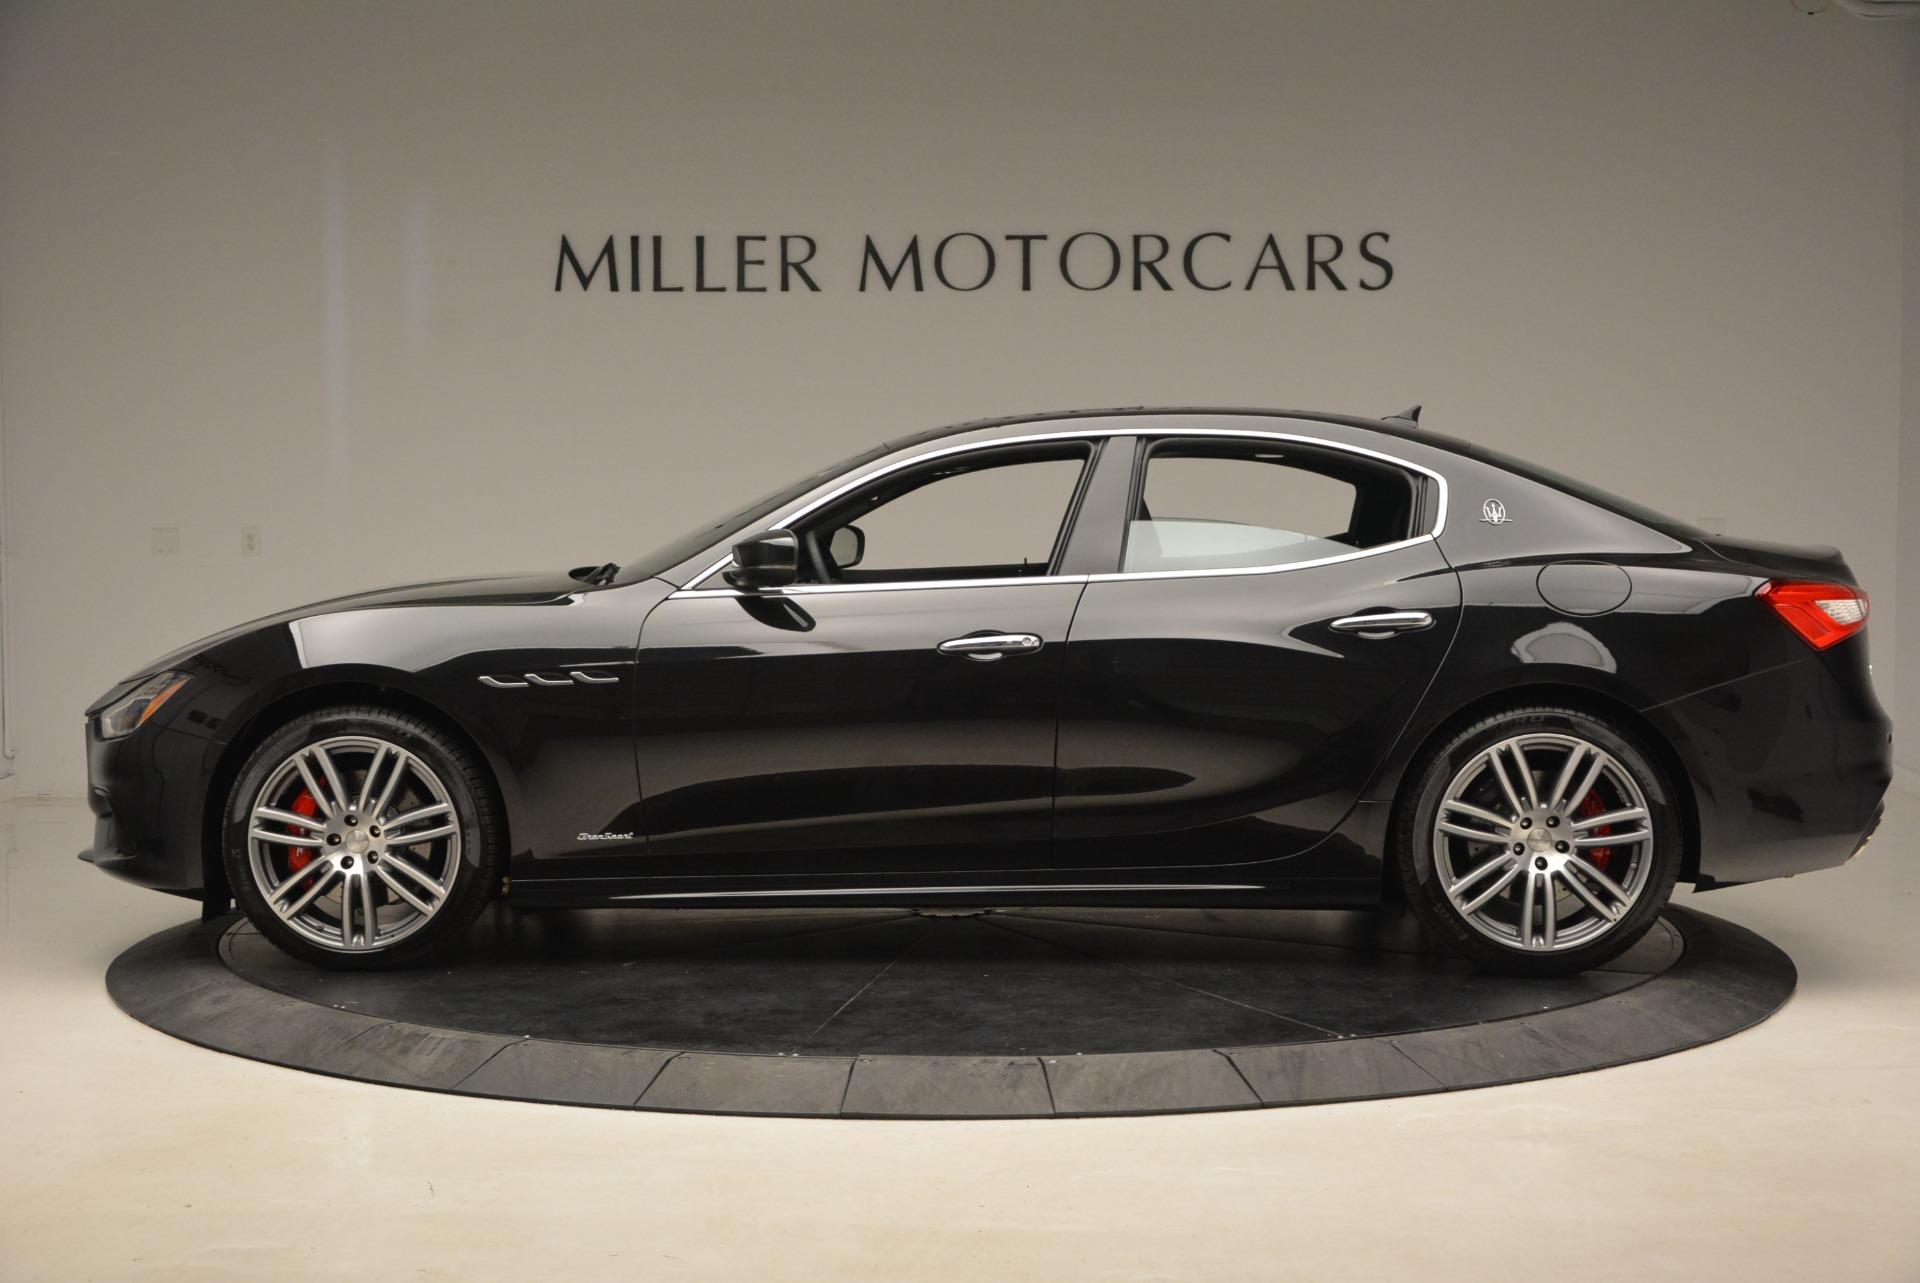 New 2018 Maserati Ghibli S Q4 Gransport For Sale In Westport, CT 2036_p3